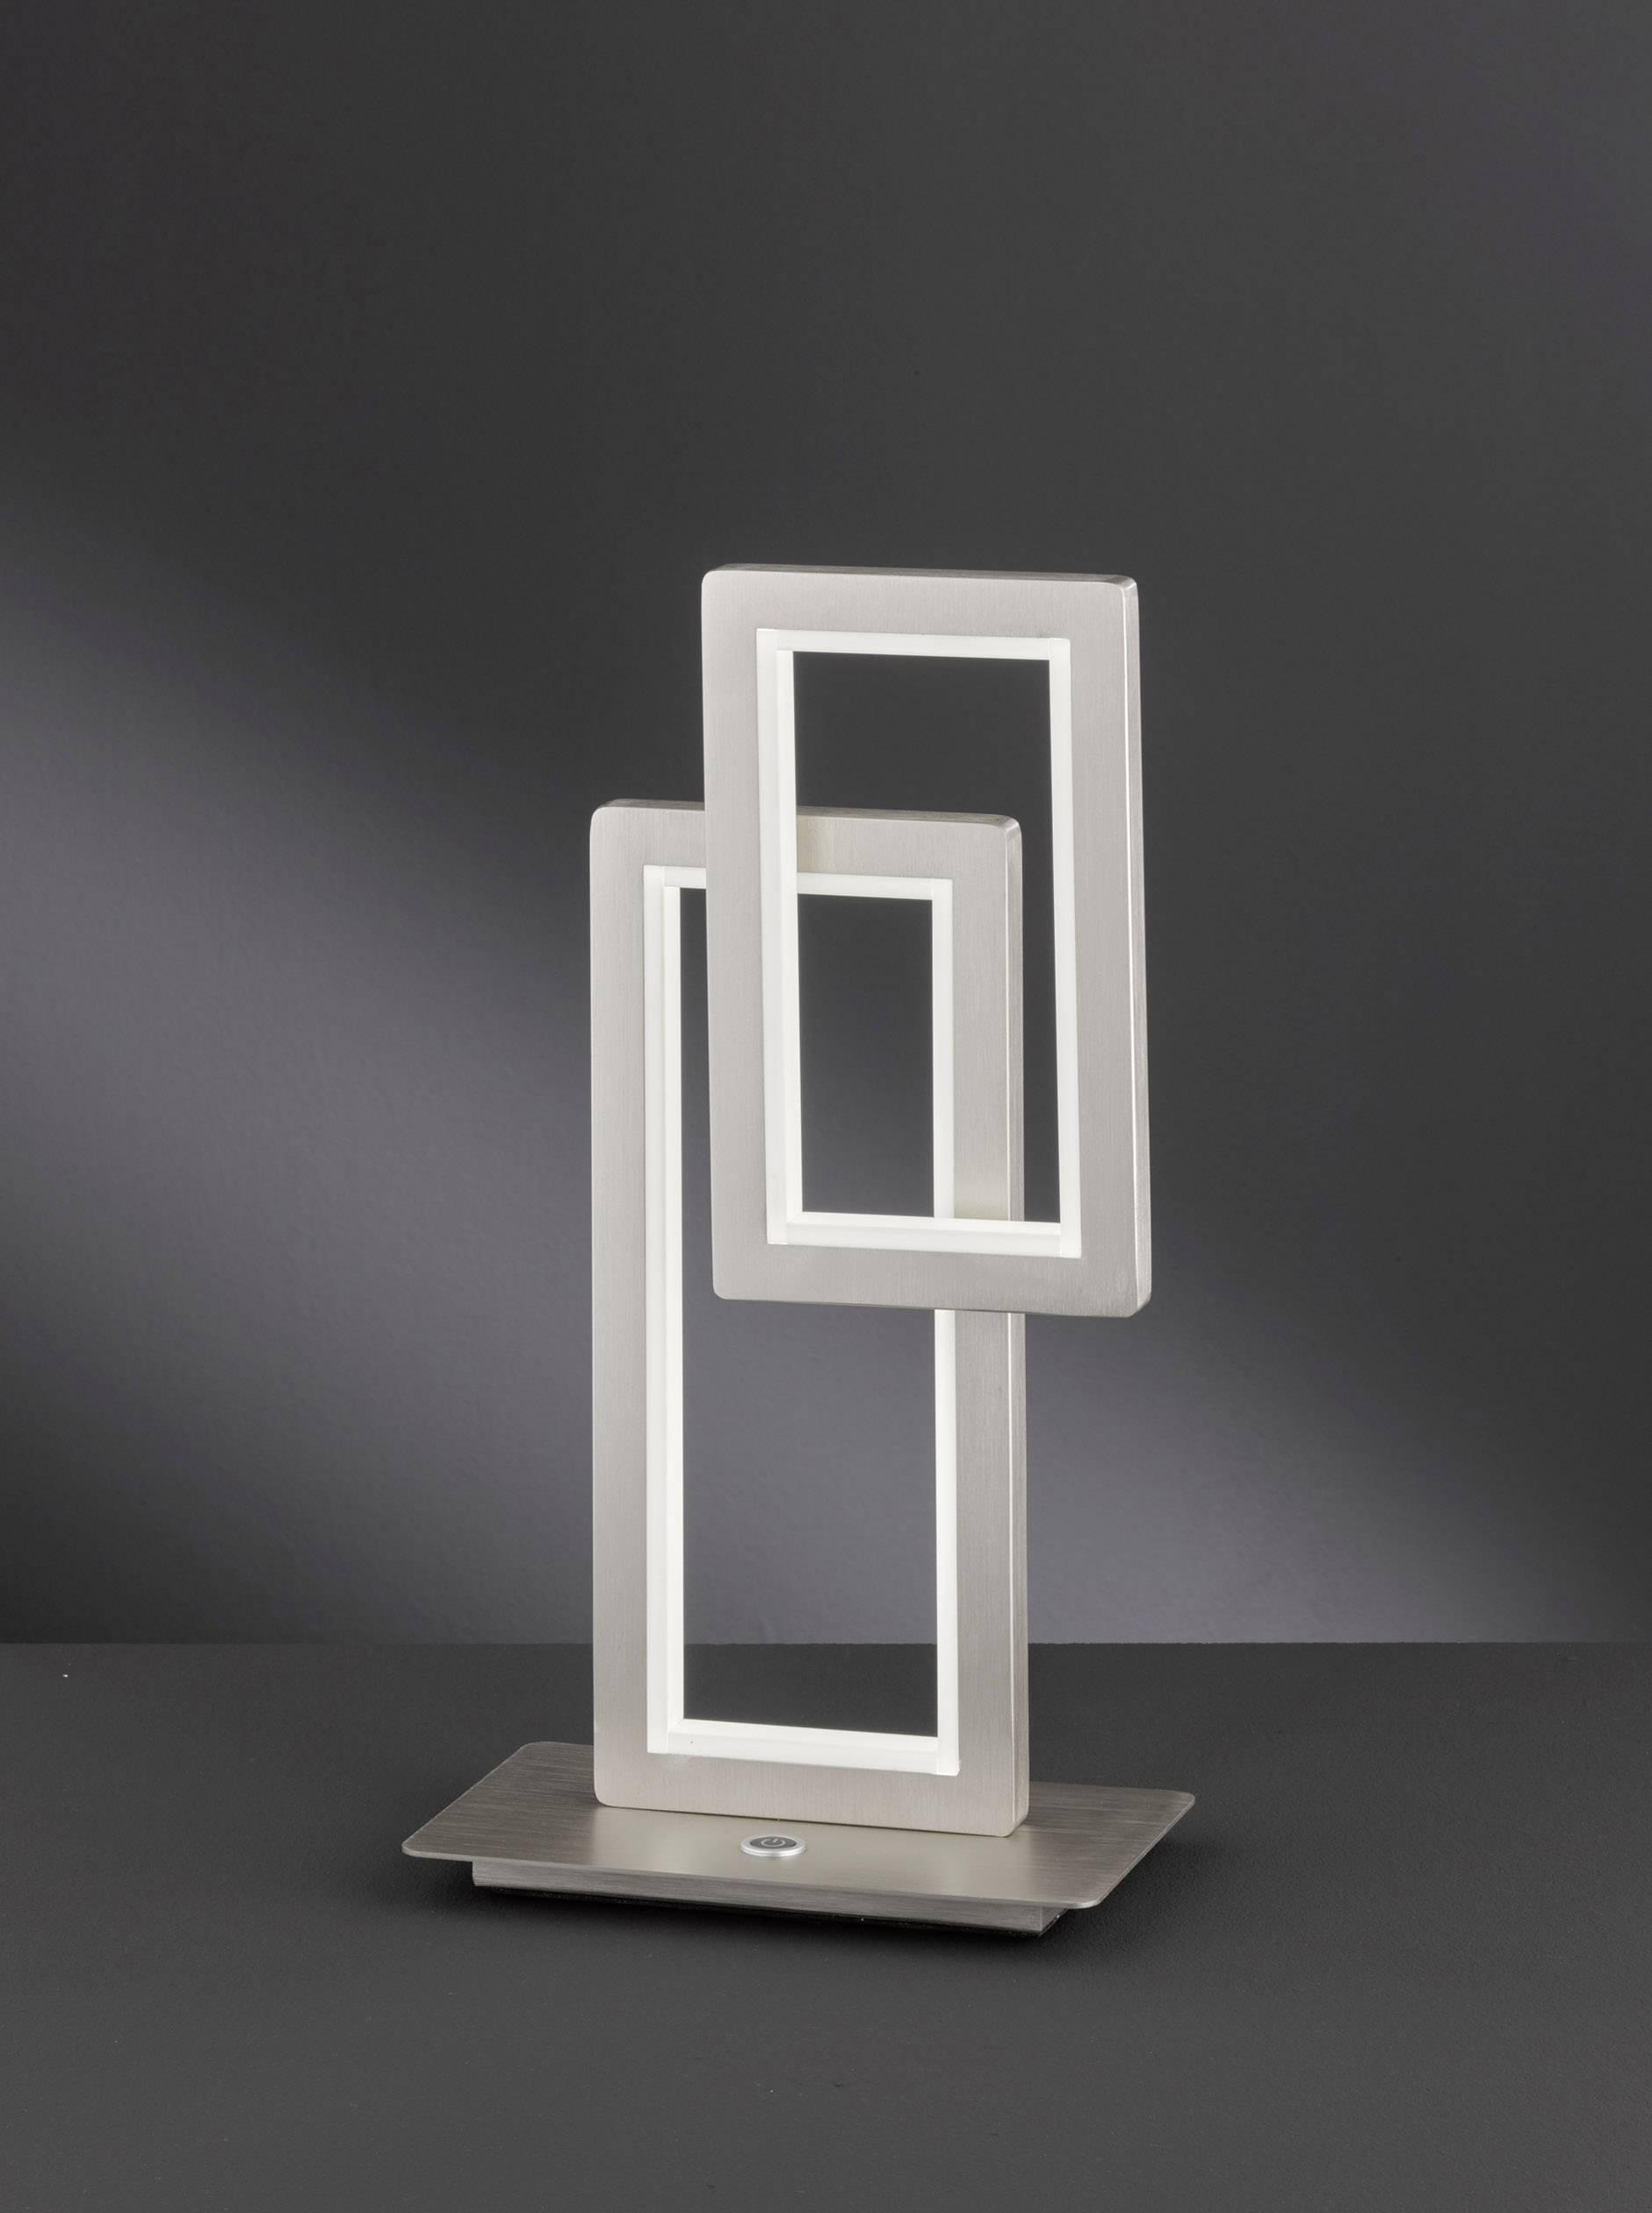 Lampe A Led De Table 18 W X Led Integree Blanc Chaud Wofi Viso